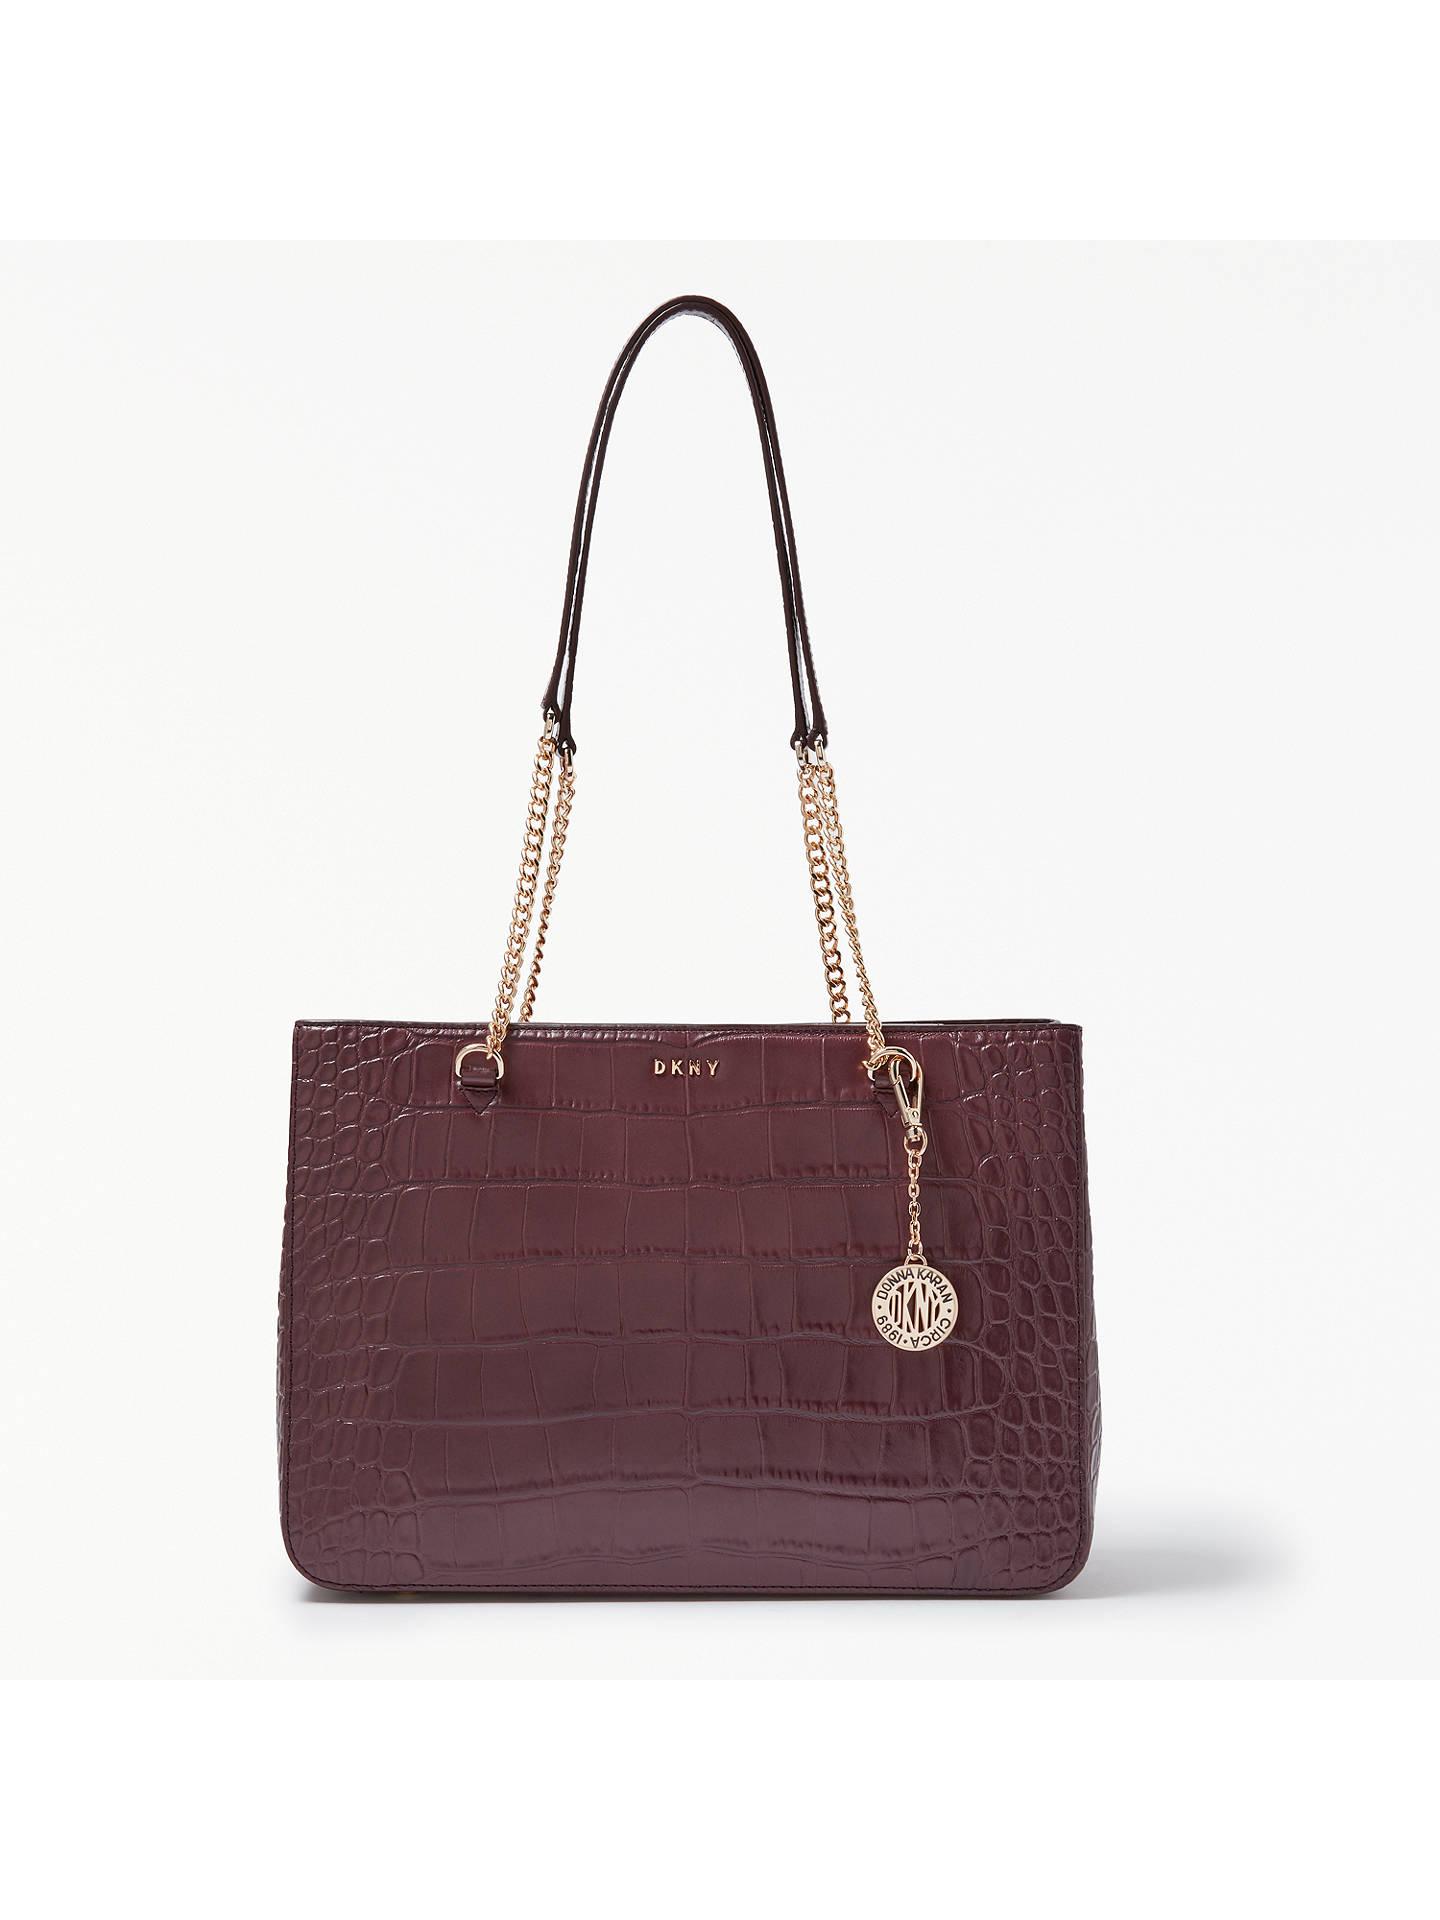 ff21366827 DKNY Sutton Croc Effect Leather Shopper Bag at John Lewis   Partners